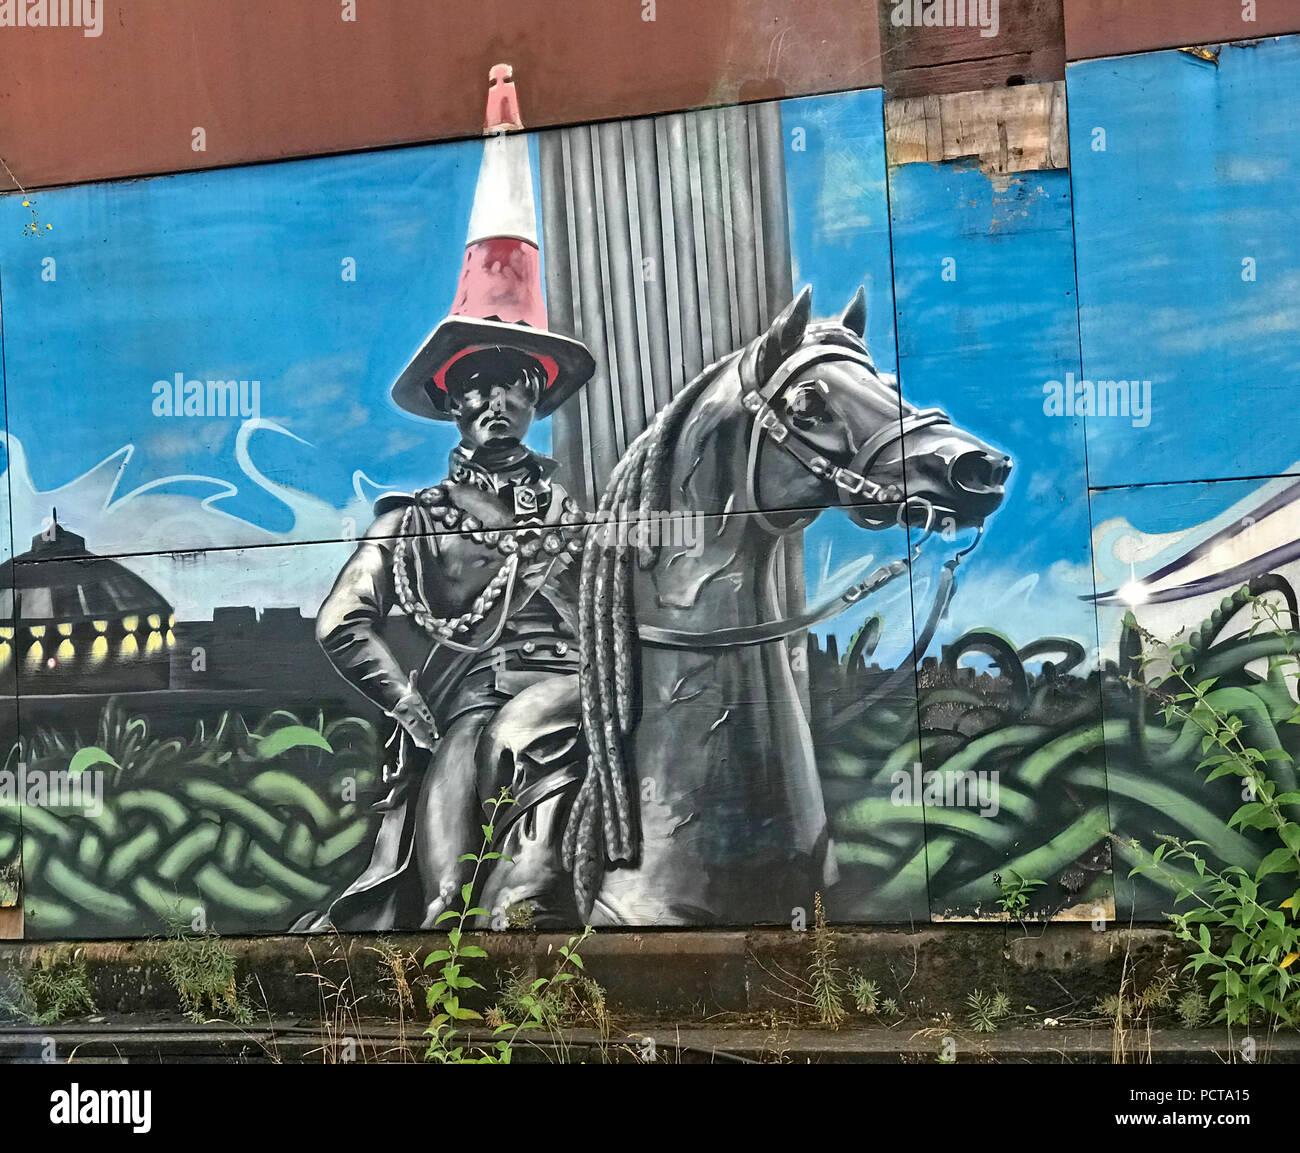 GoTonySmith,@HotpixUK,Strathclyde,UK,graffiti